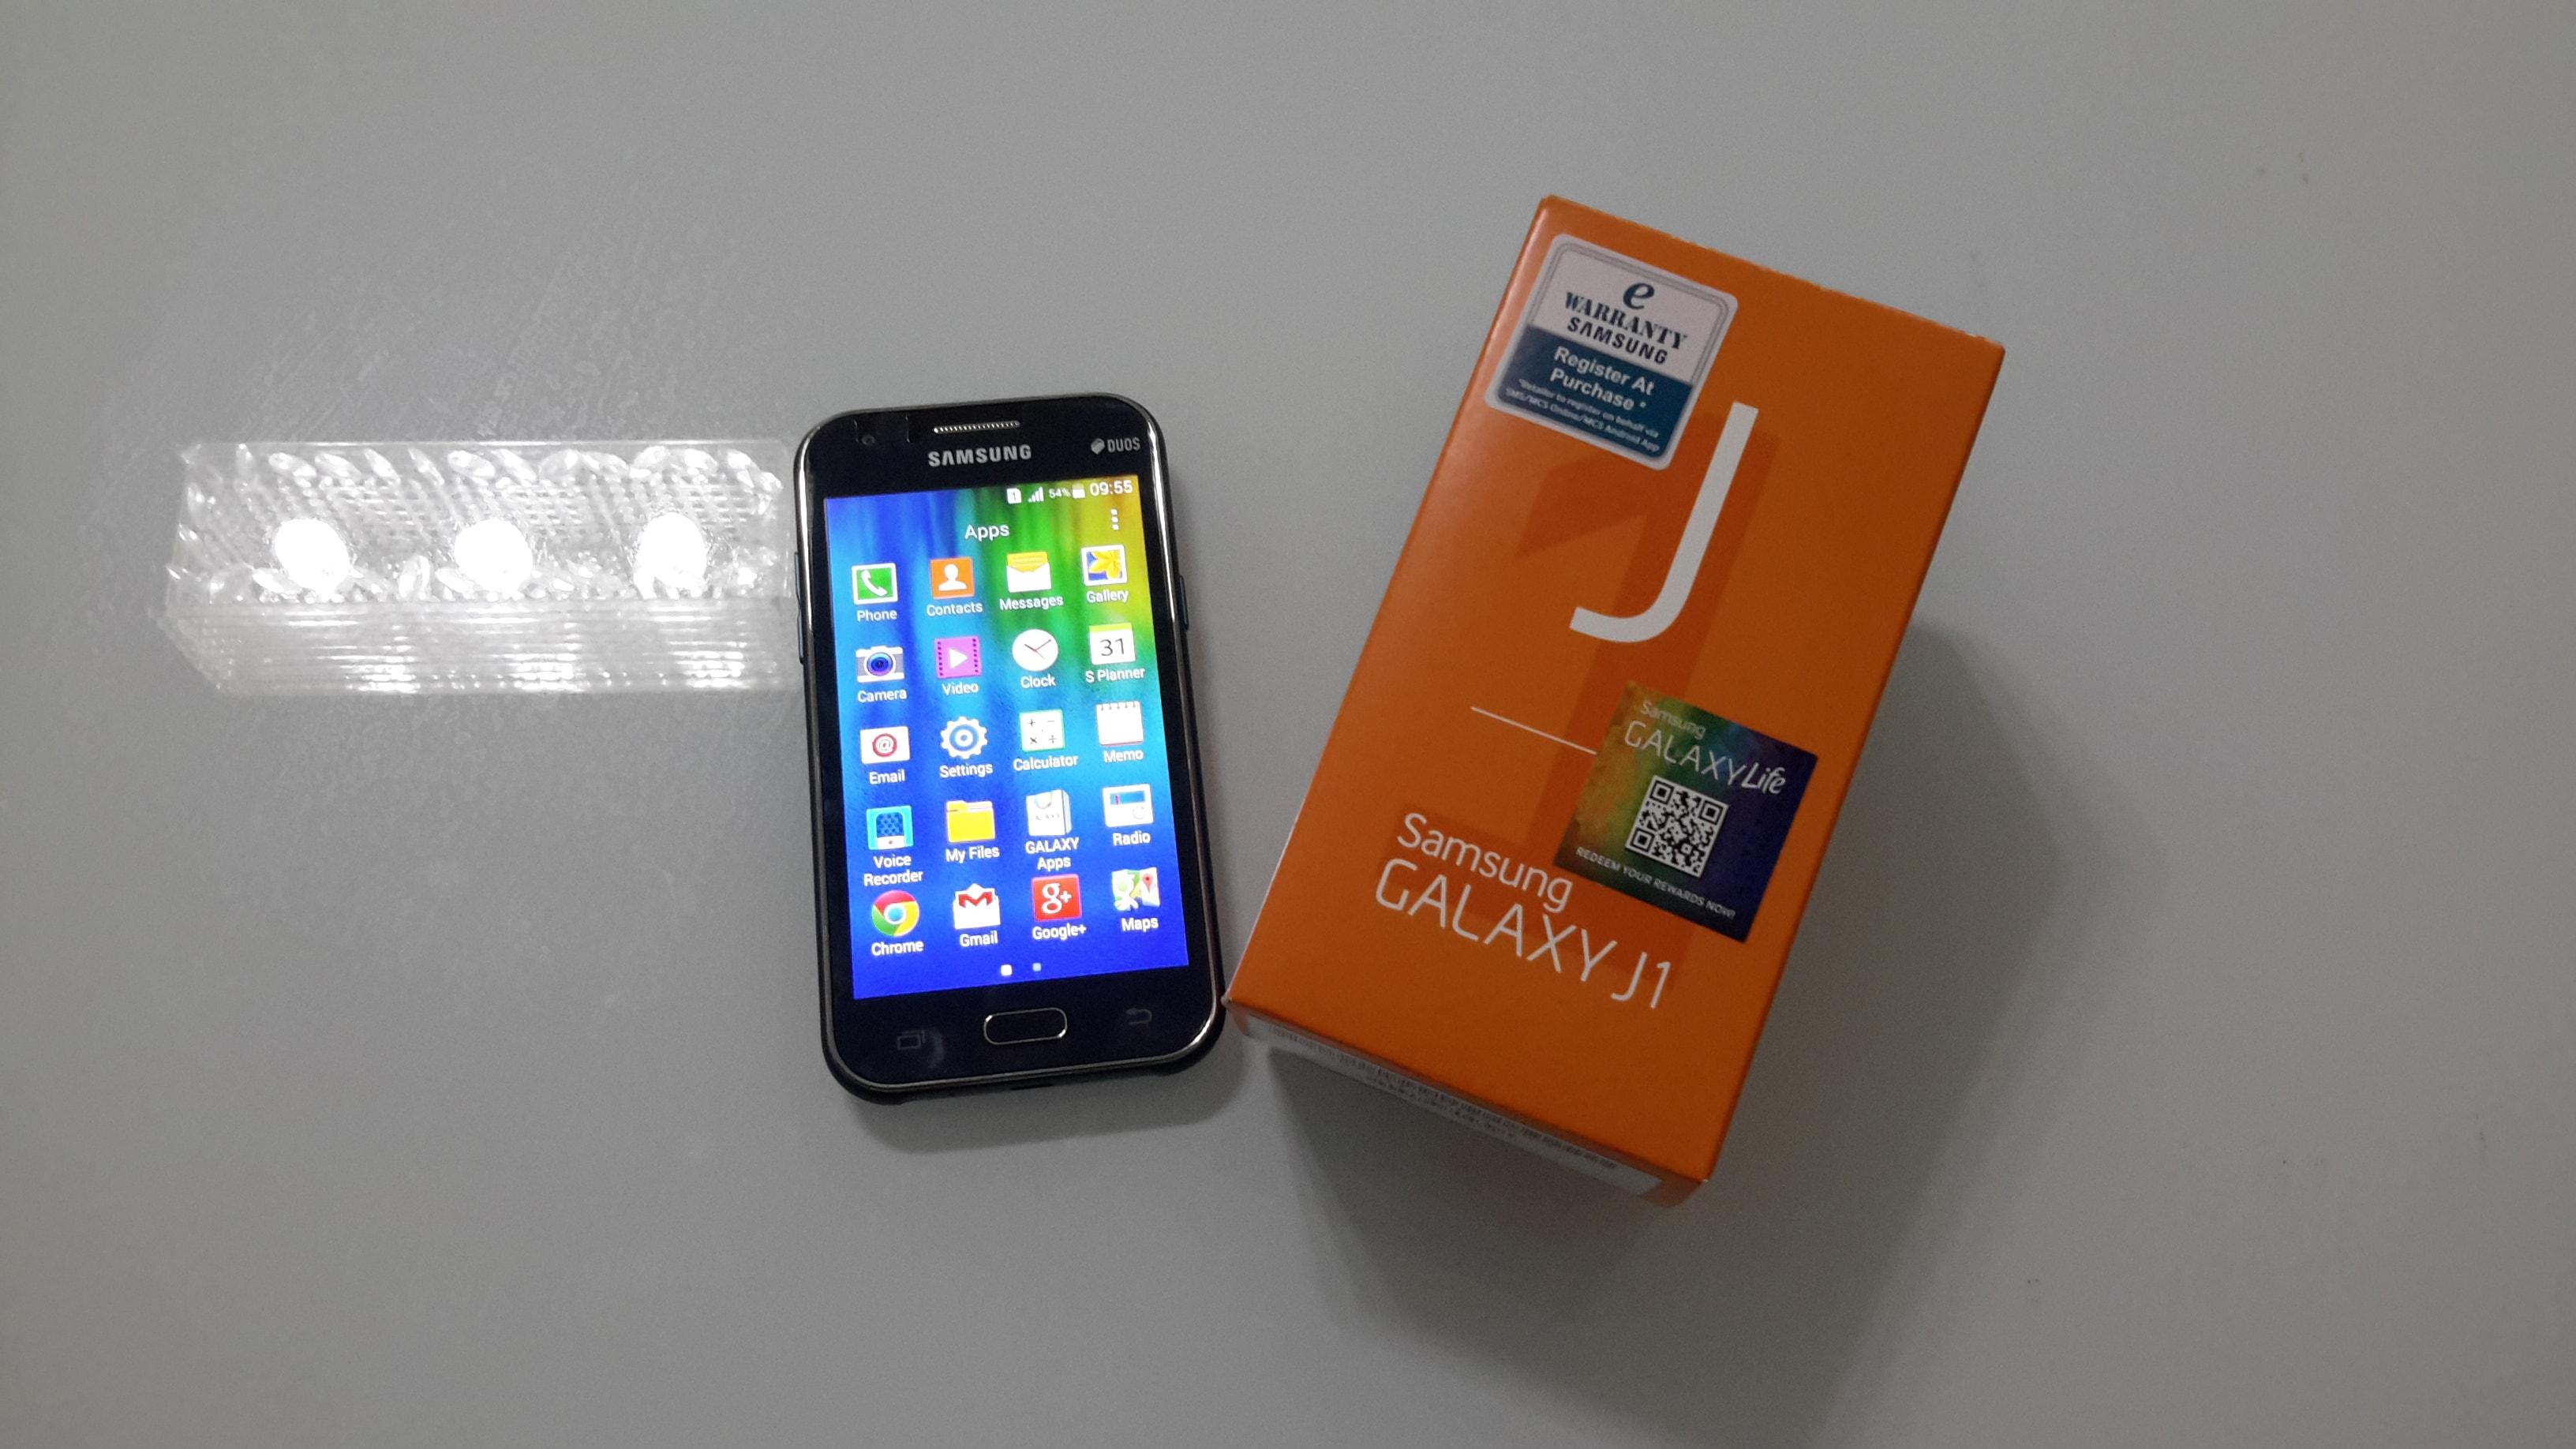 Samsung Galaxy J1 Kutu Resmi Min Kisiyorumlari